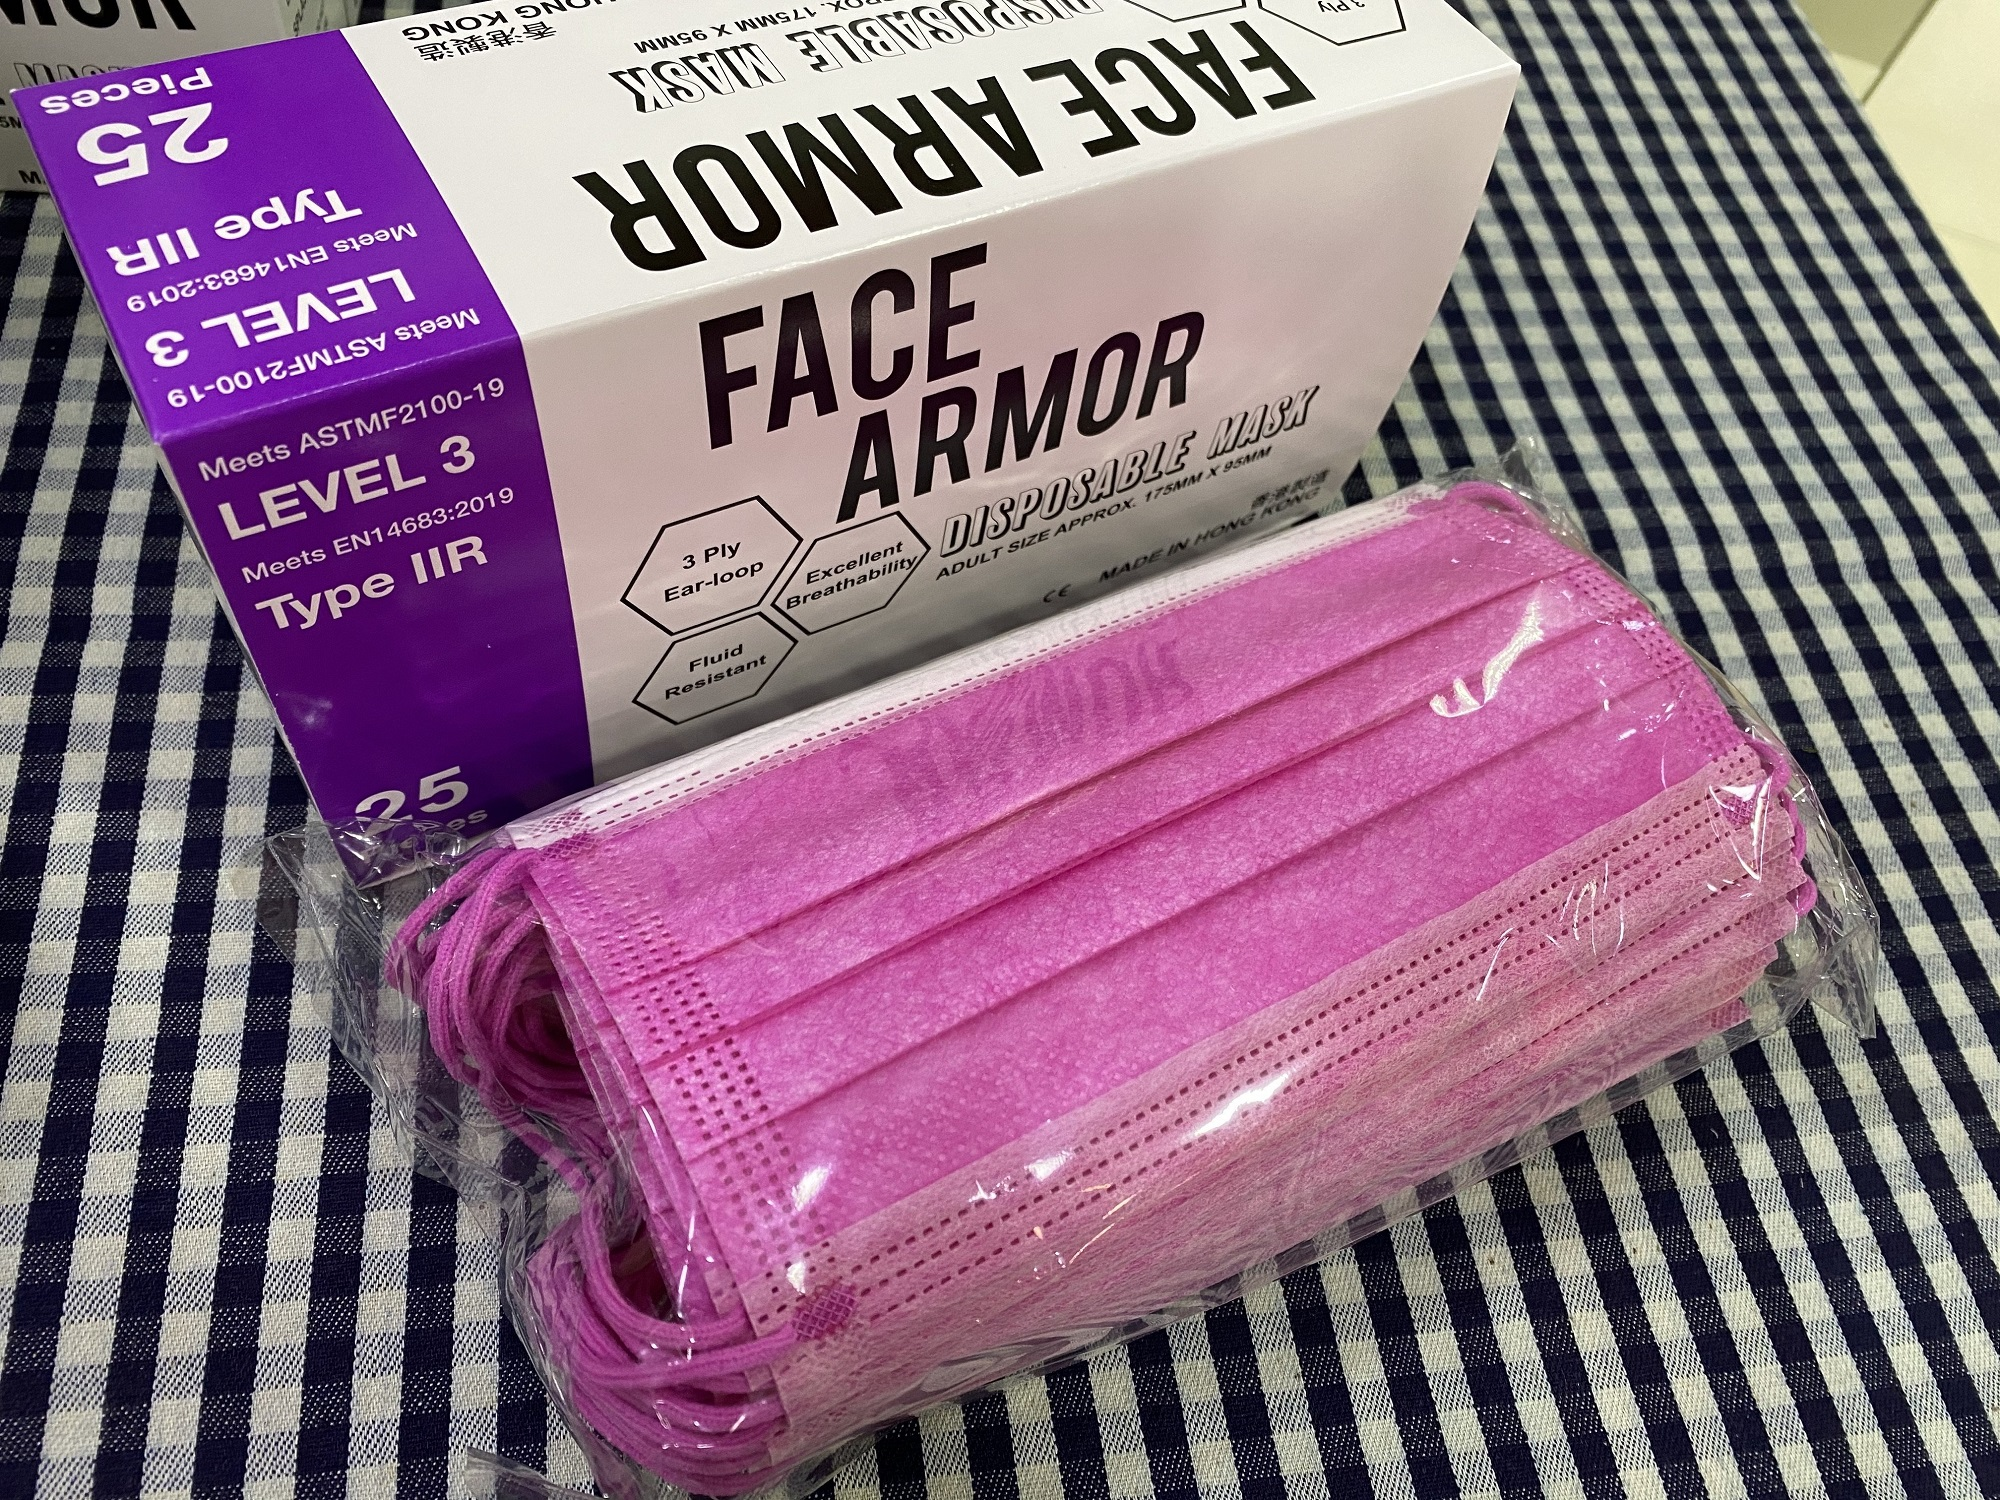 Face Armor Disposable Masks | ASTM LEVEL 3 | Made in Hong Kong| 25 PIECES | FUCHSIA W/ FUCHSIA EARLOOP